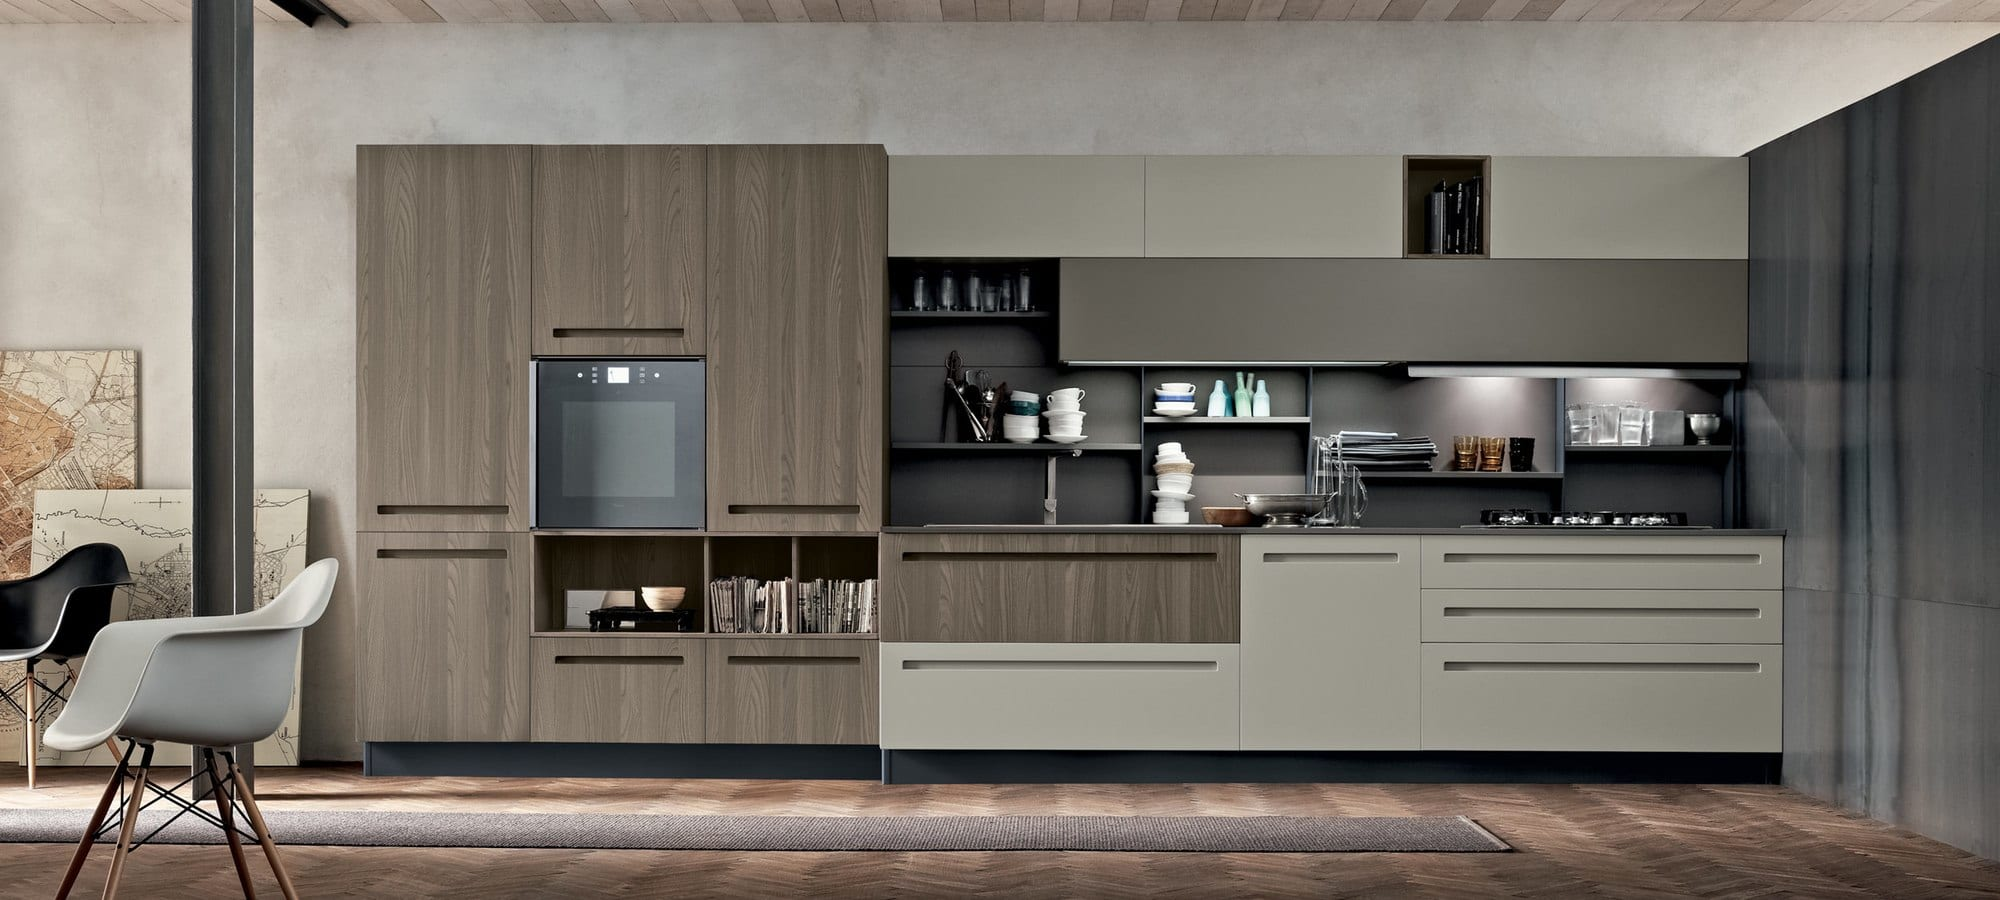 Cucina stosa raimondi idee casa - Cucine stosa moderne ...